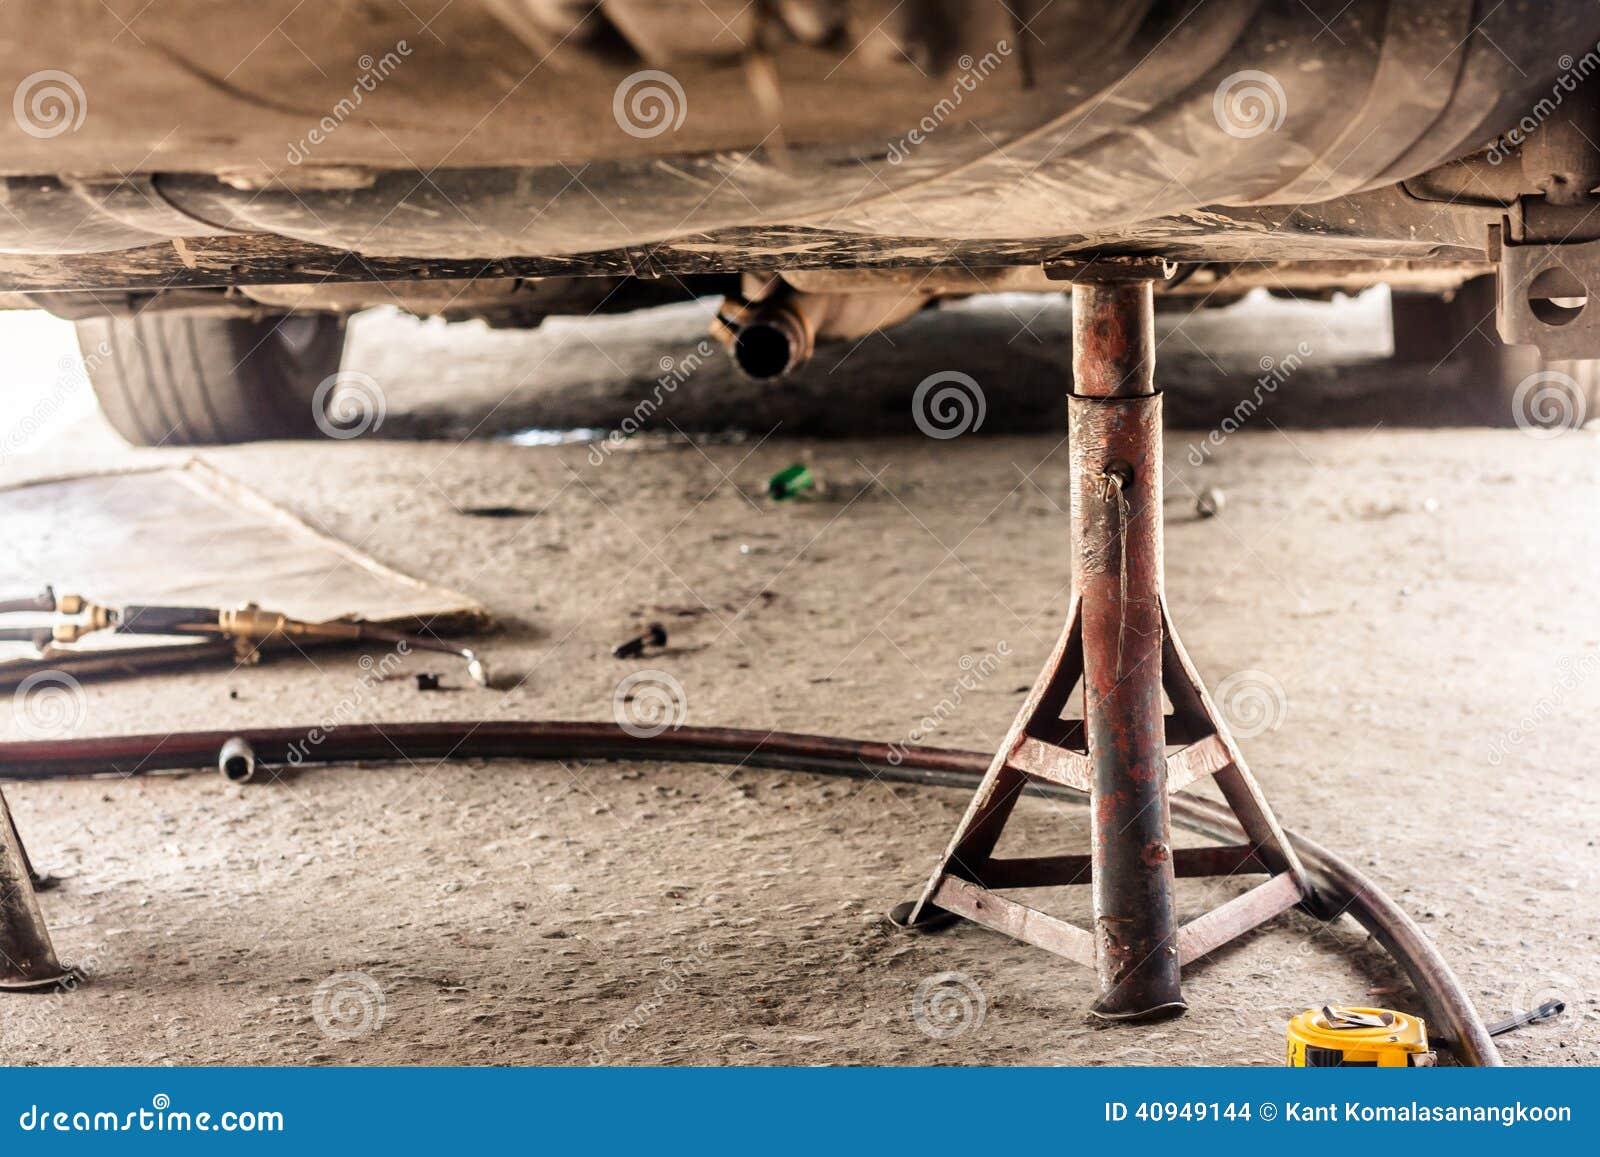 Car Suspension Maintenance Stock Photo Image 40949144